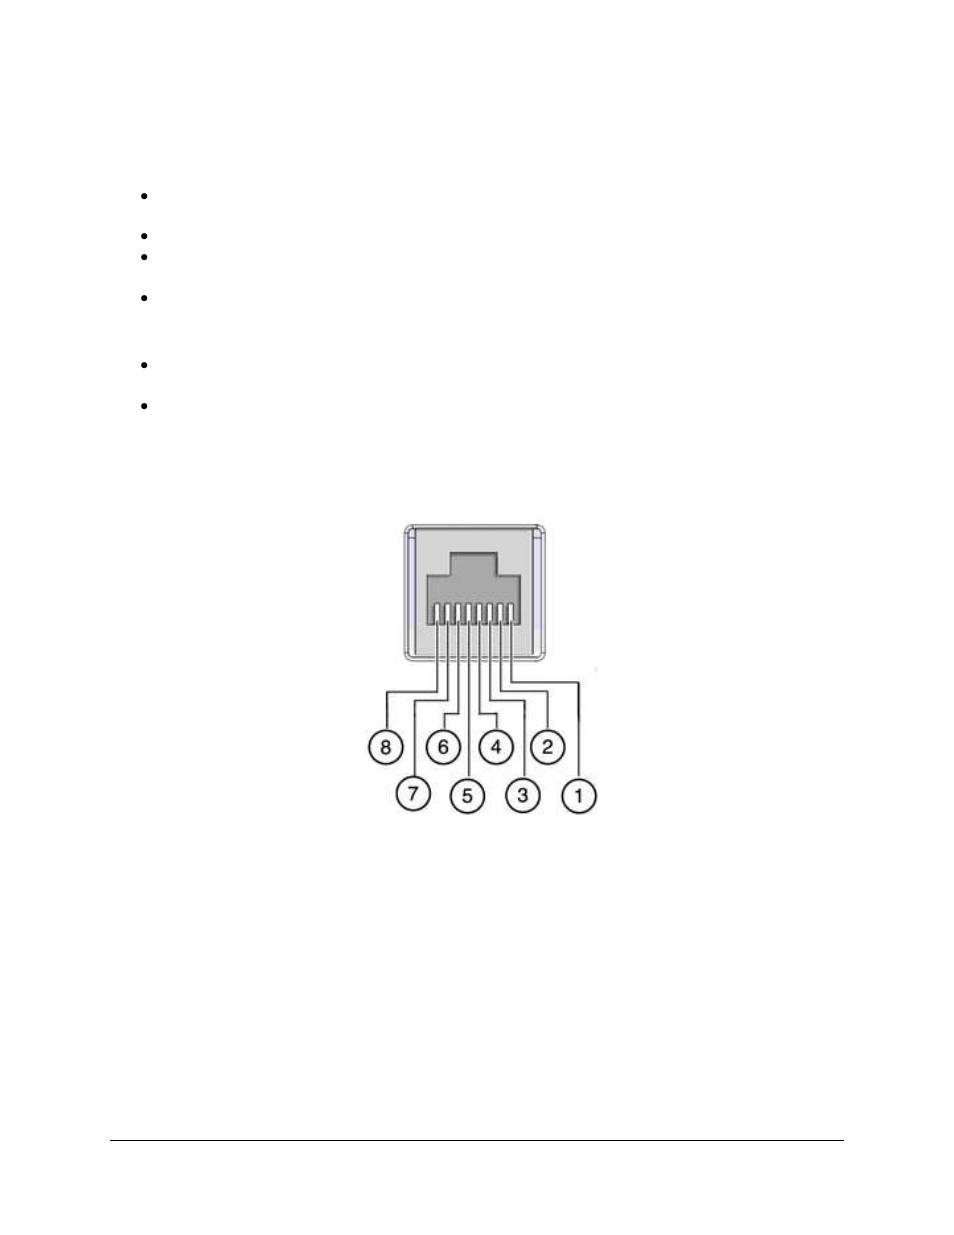 medium resolution of 1 audio and gpio installation doremi showvault imb user manual page 15 36